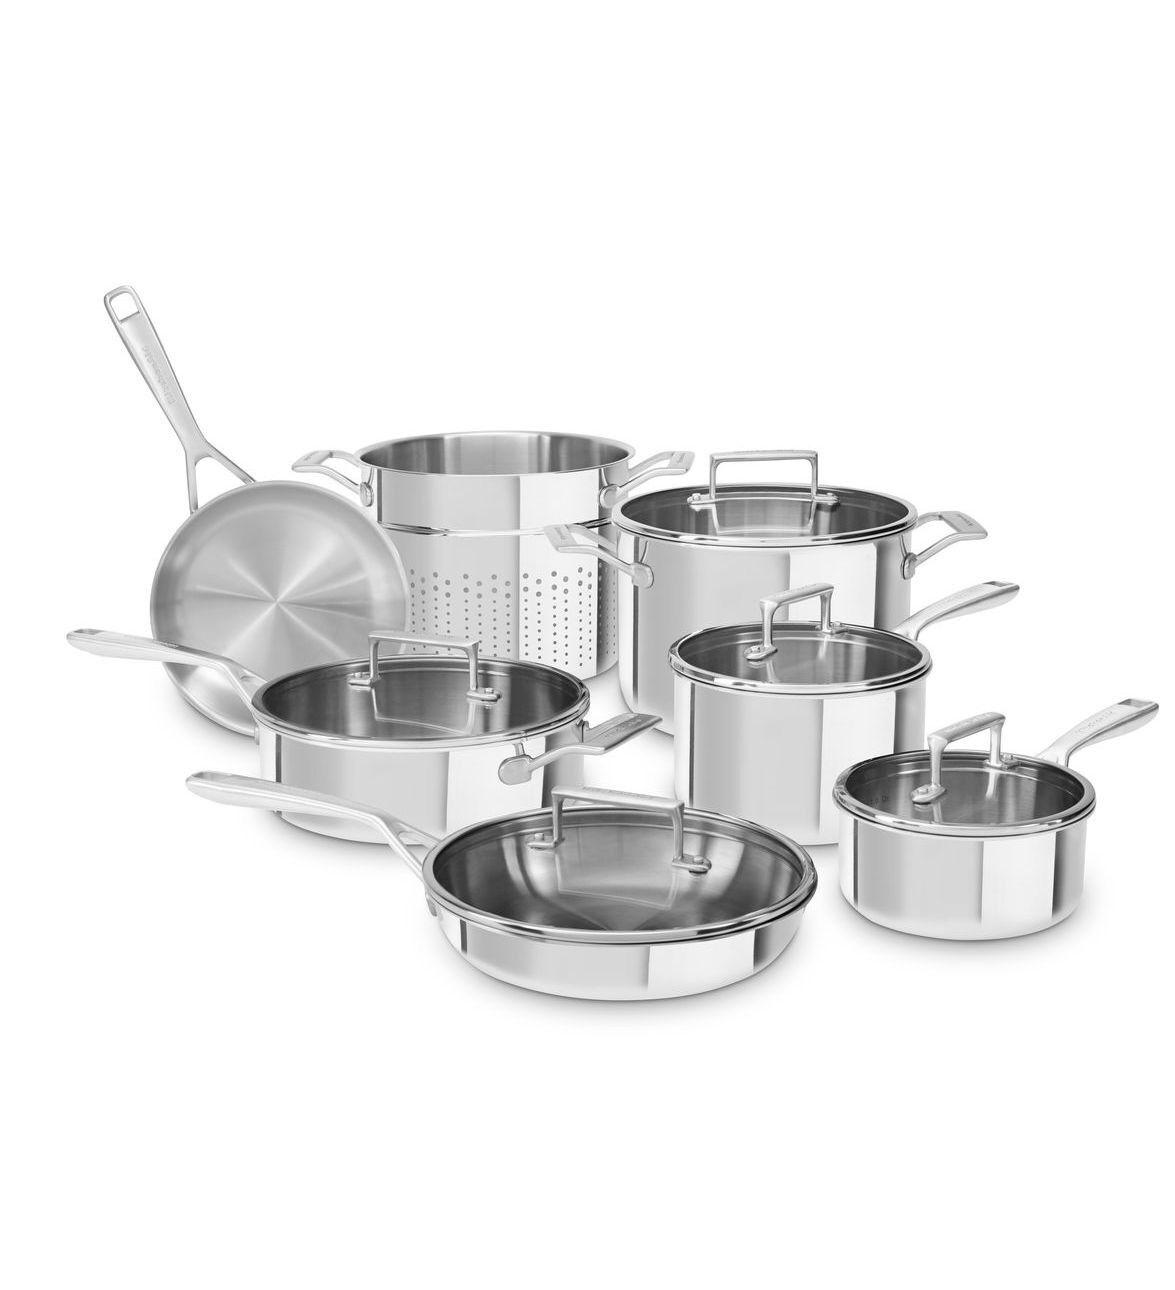 KitchenAid Tri-Ply Stainless Steel 12-Piece Set   KC2TS12ST